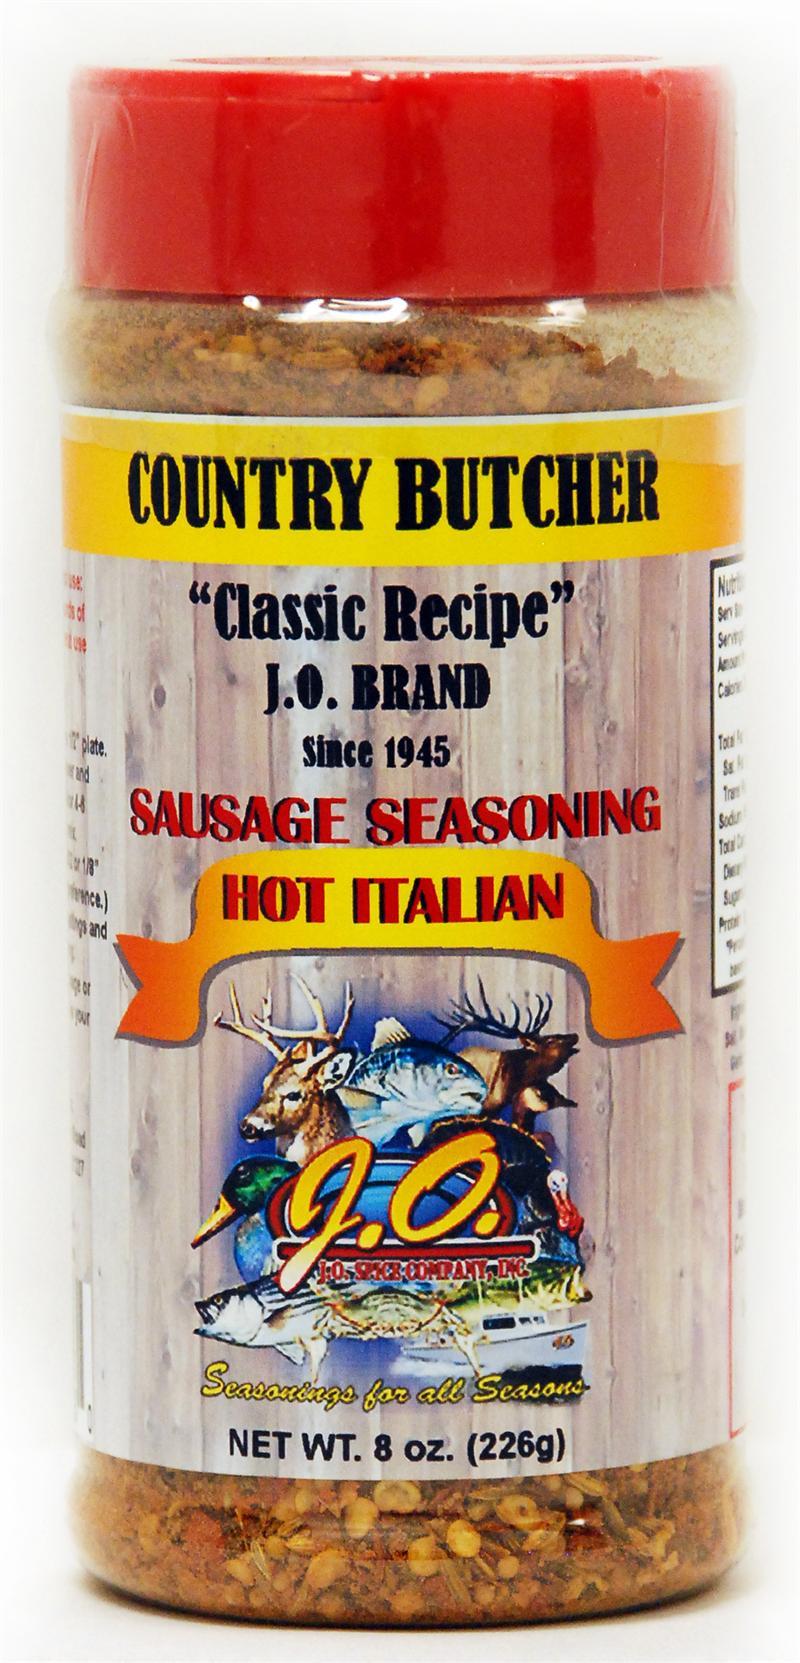 Hot Italian Sausage Seasoning 8 oz  Container